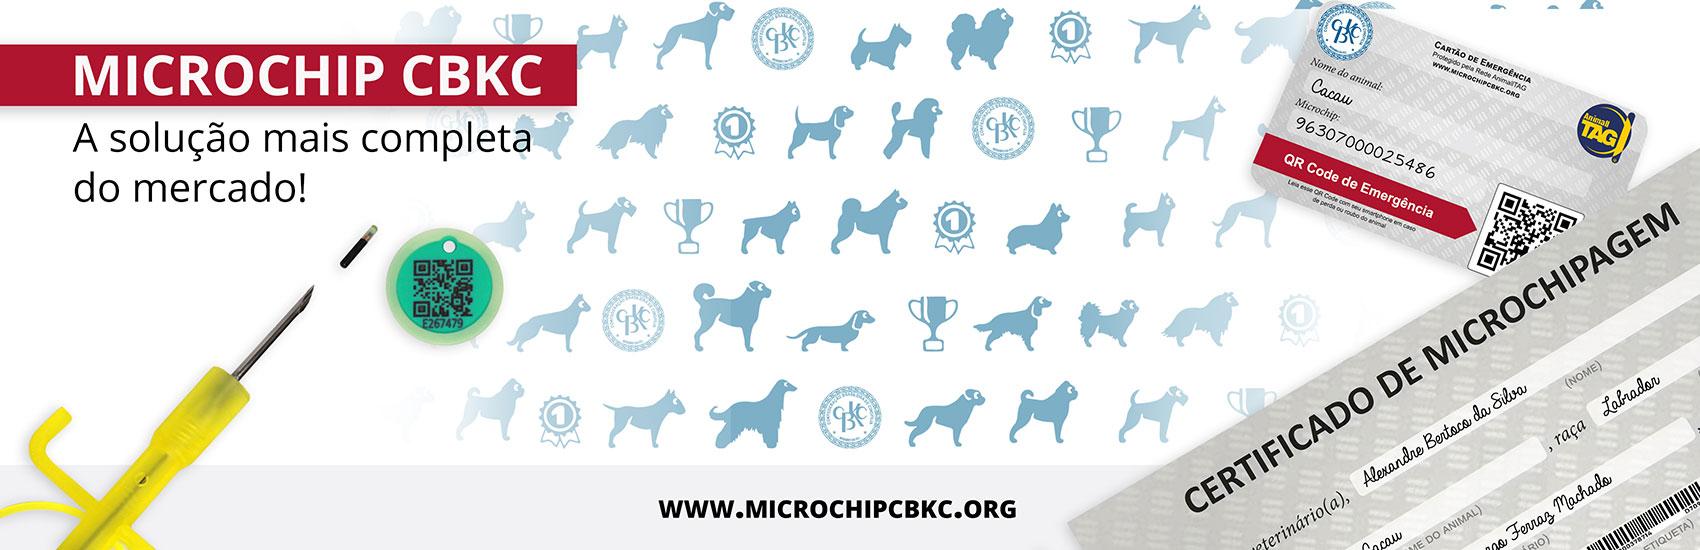 CBKC - Microchip CBKC.